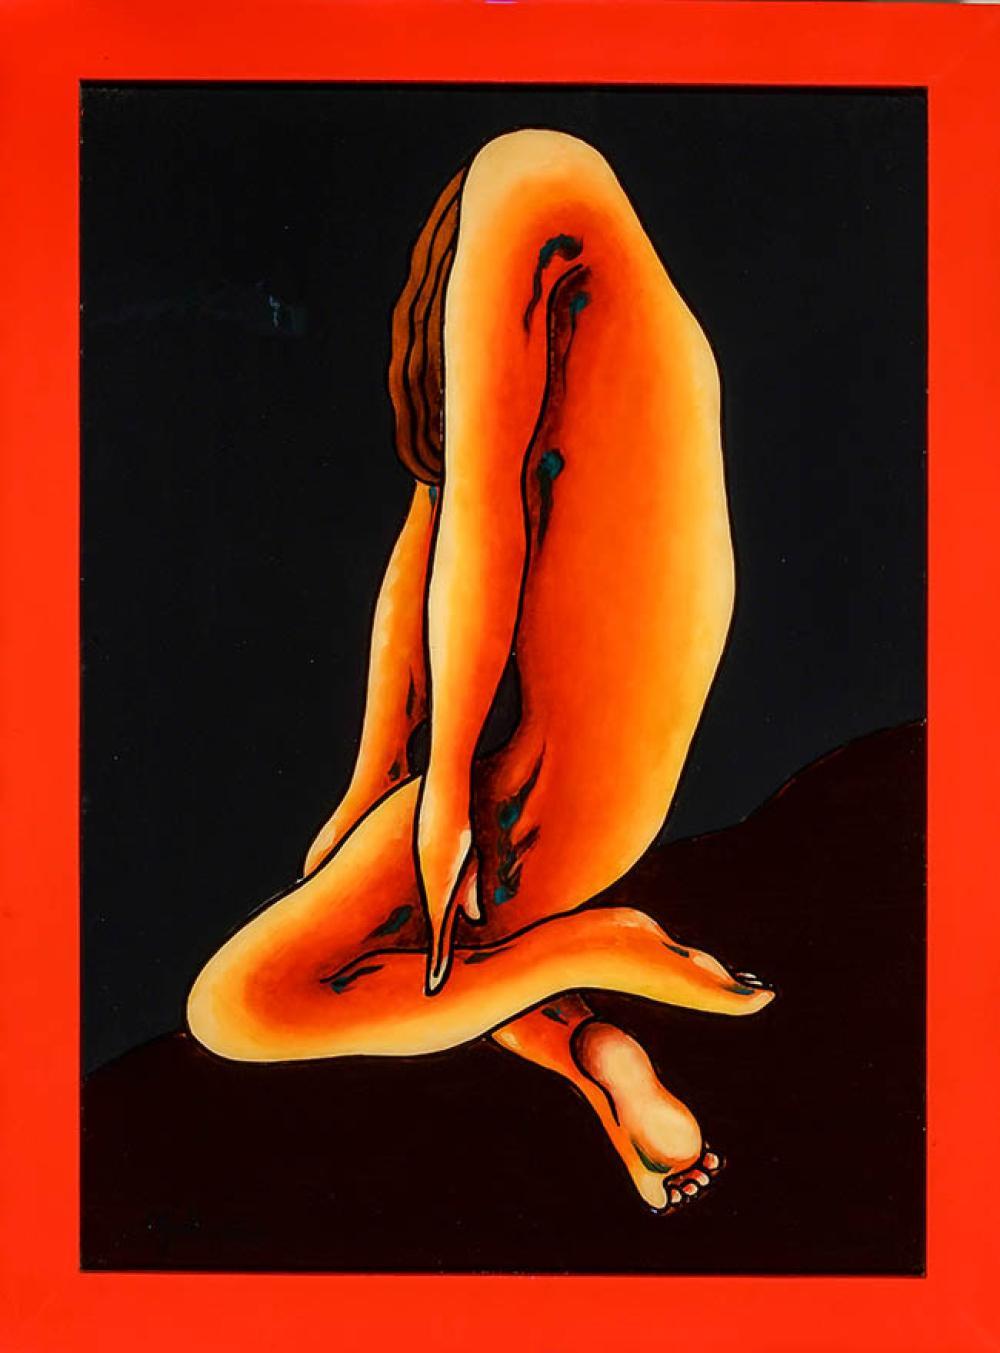 Yordi Buergo (Cuban b. 1961), Sadness, Oil and Resin on Masonite, 28 x 38 in